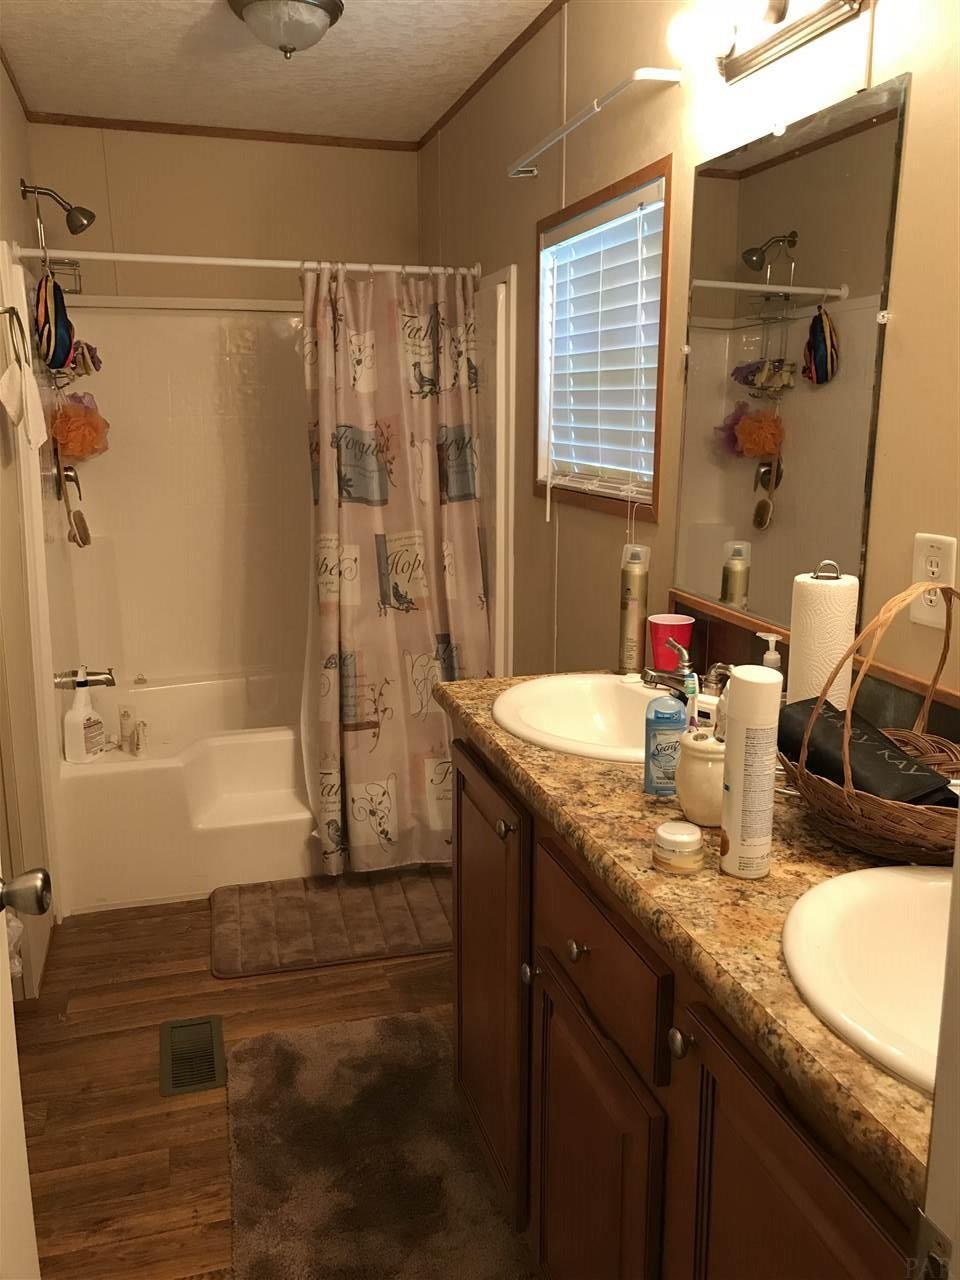 2015 N 7th Ave, Pensacola, FL 32503